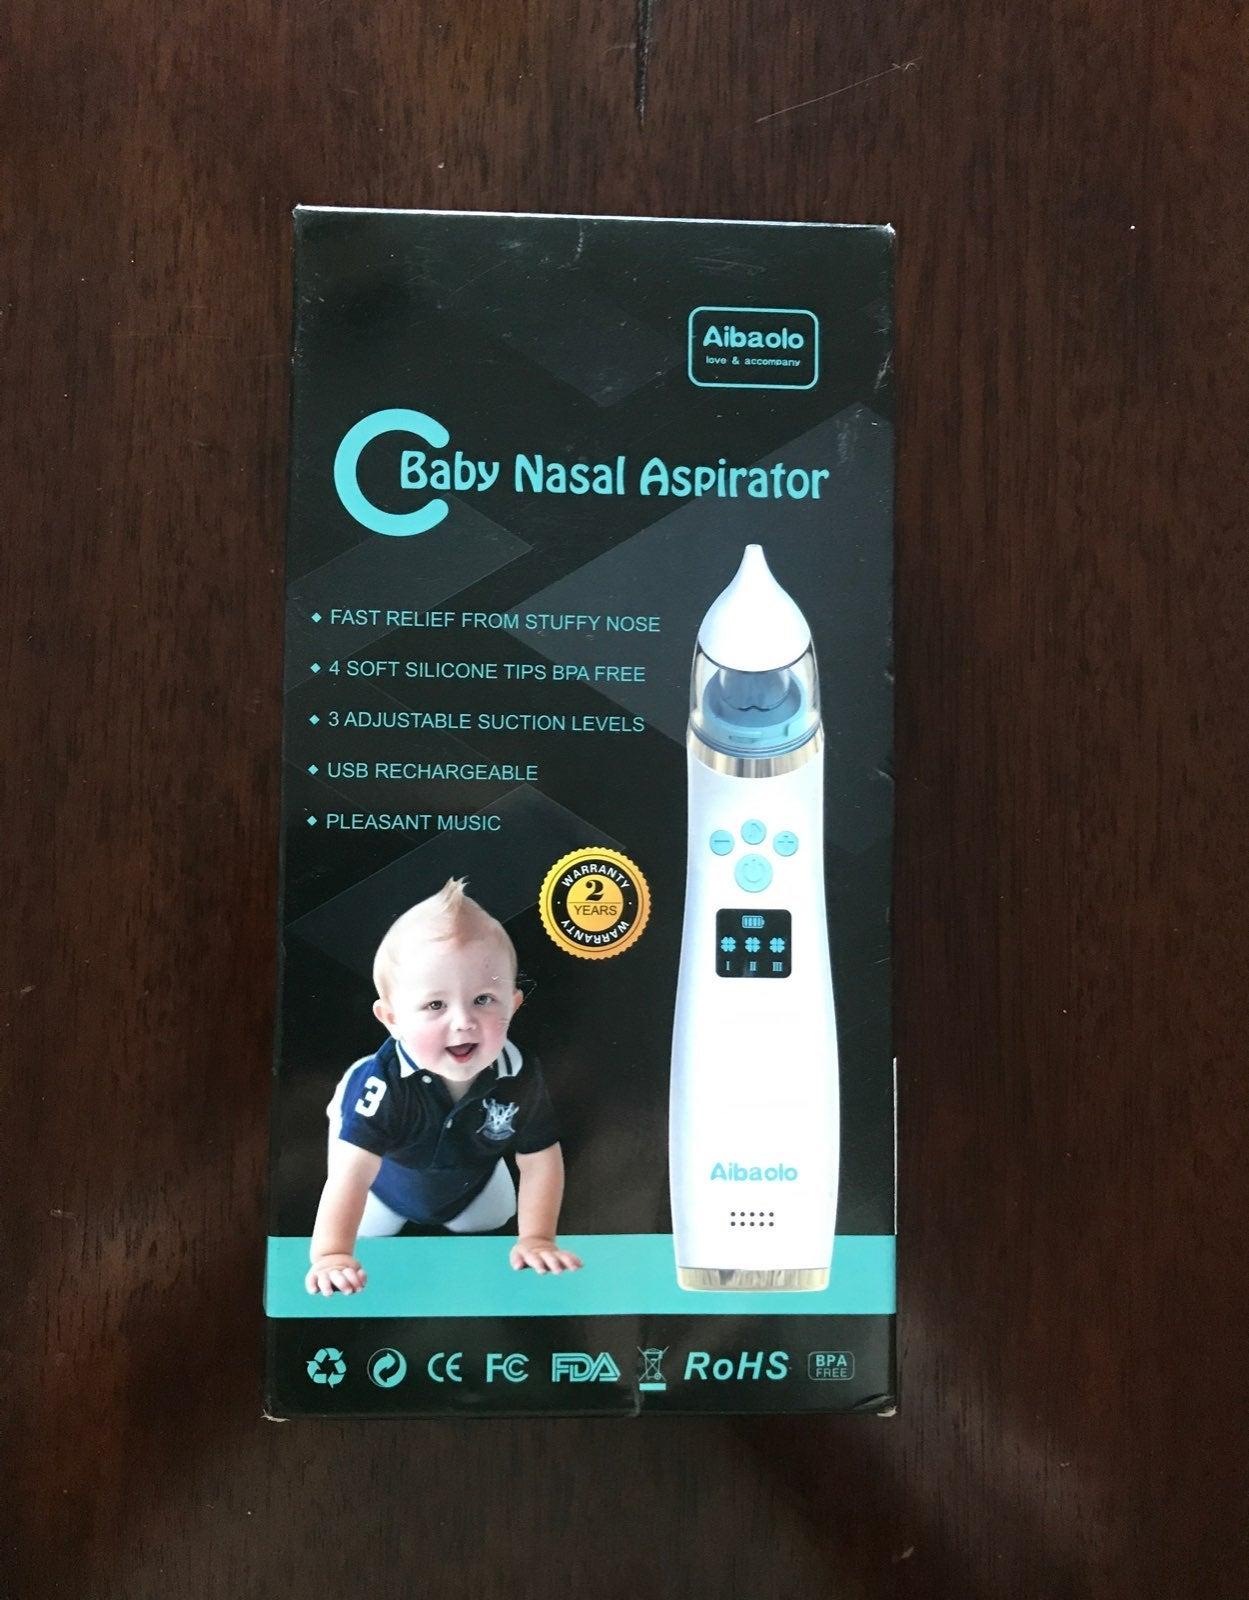 Baby nosal aspirator